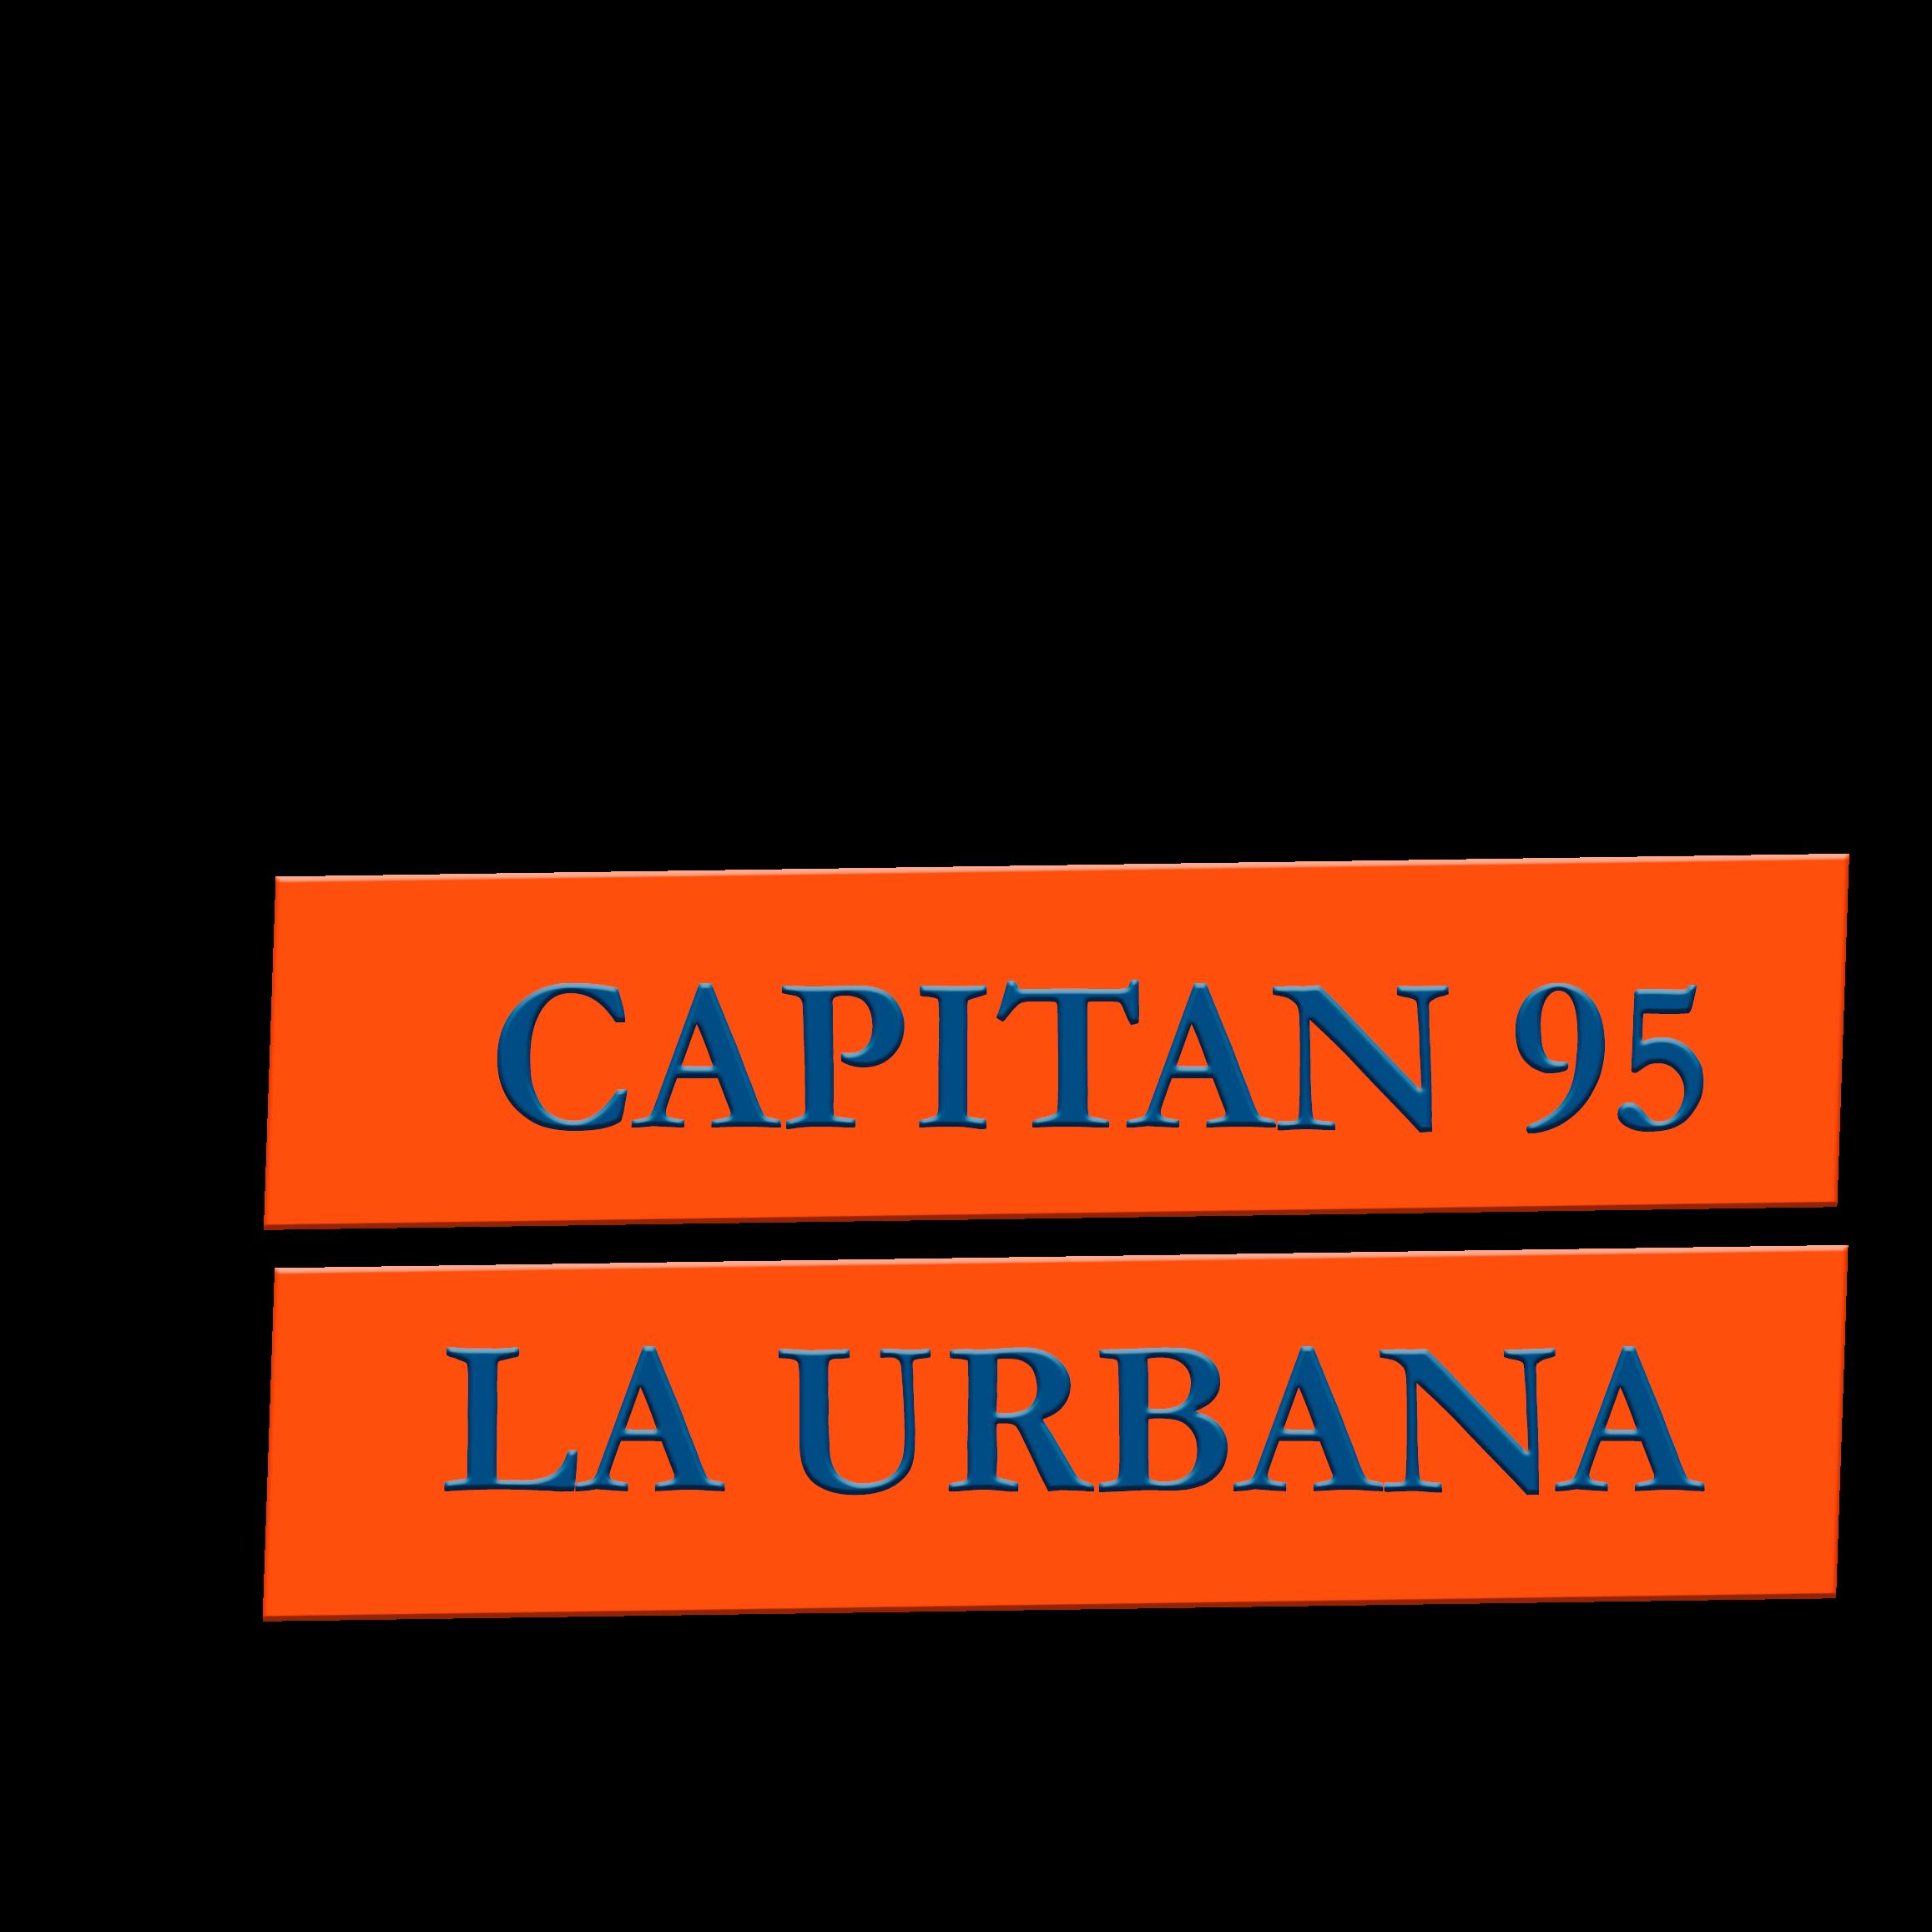 Capitan 95 La Urbana